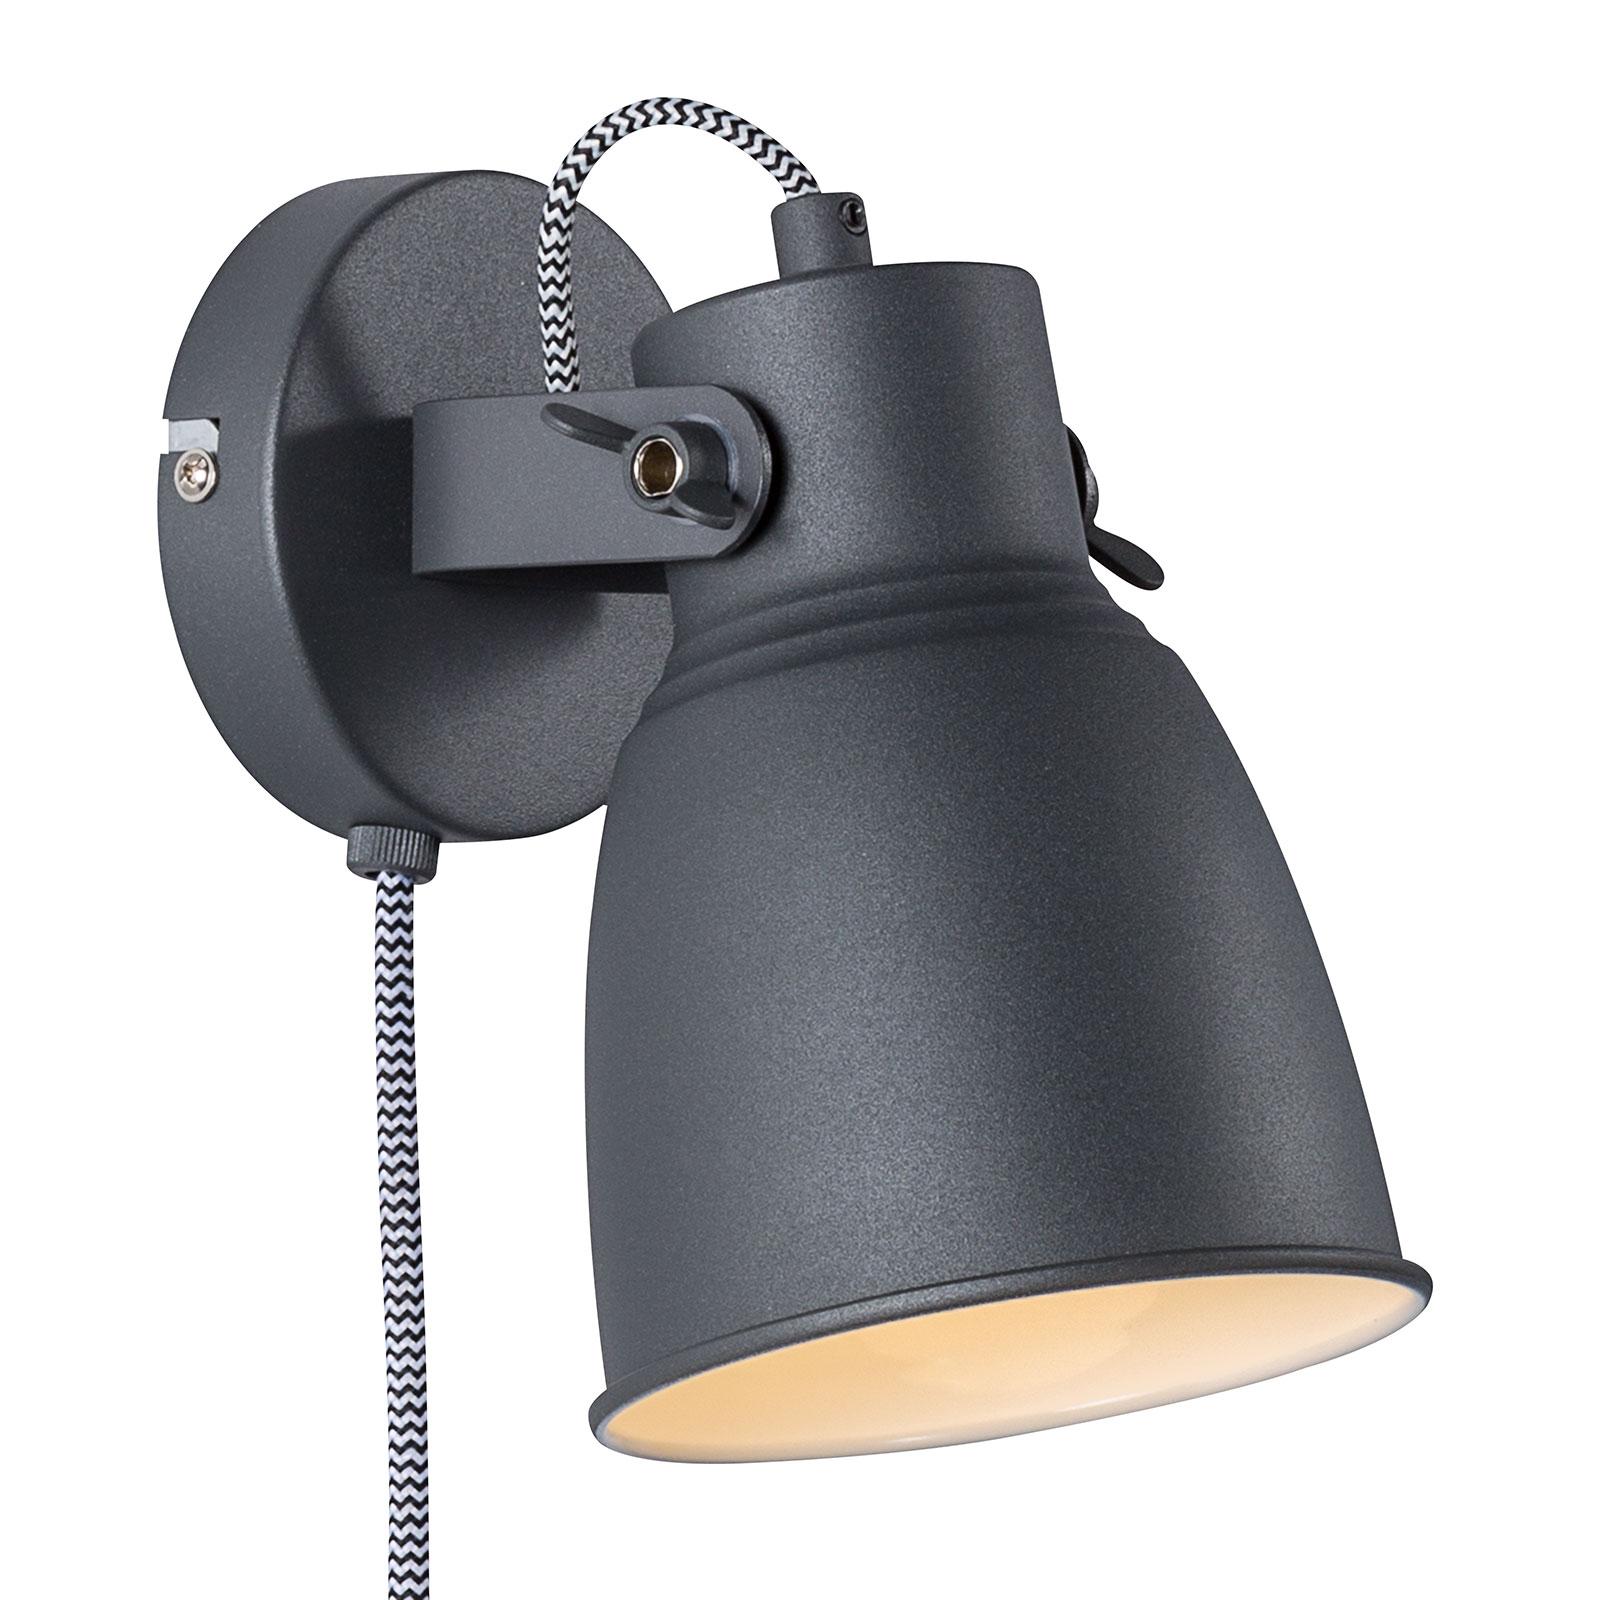 Wandlamp Adrian met kabel en stekker, zwart